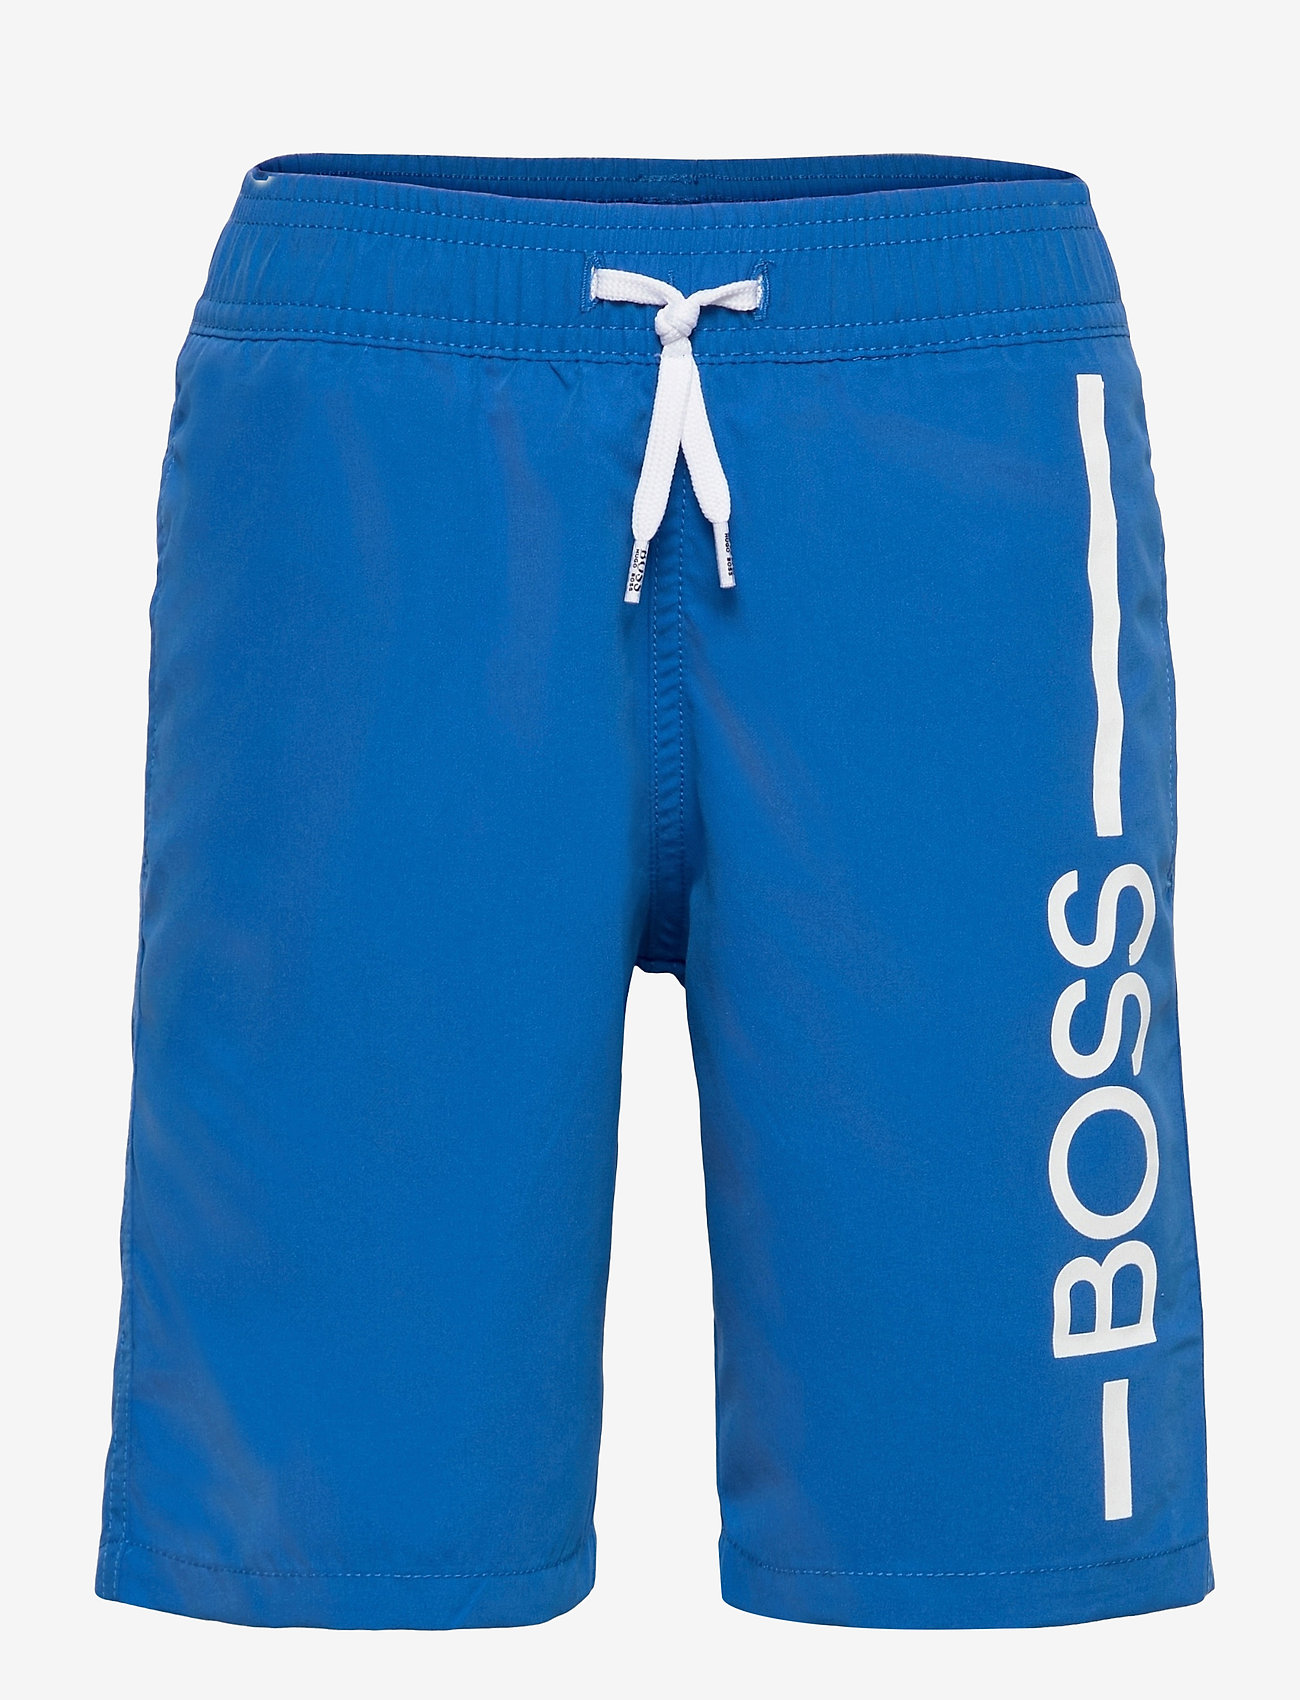 BOSS - SWIM SHORTS - badehosen - pale blue - 0